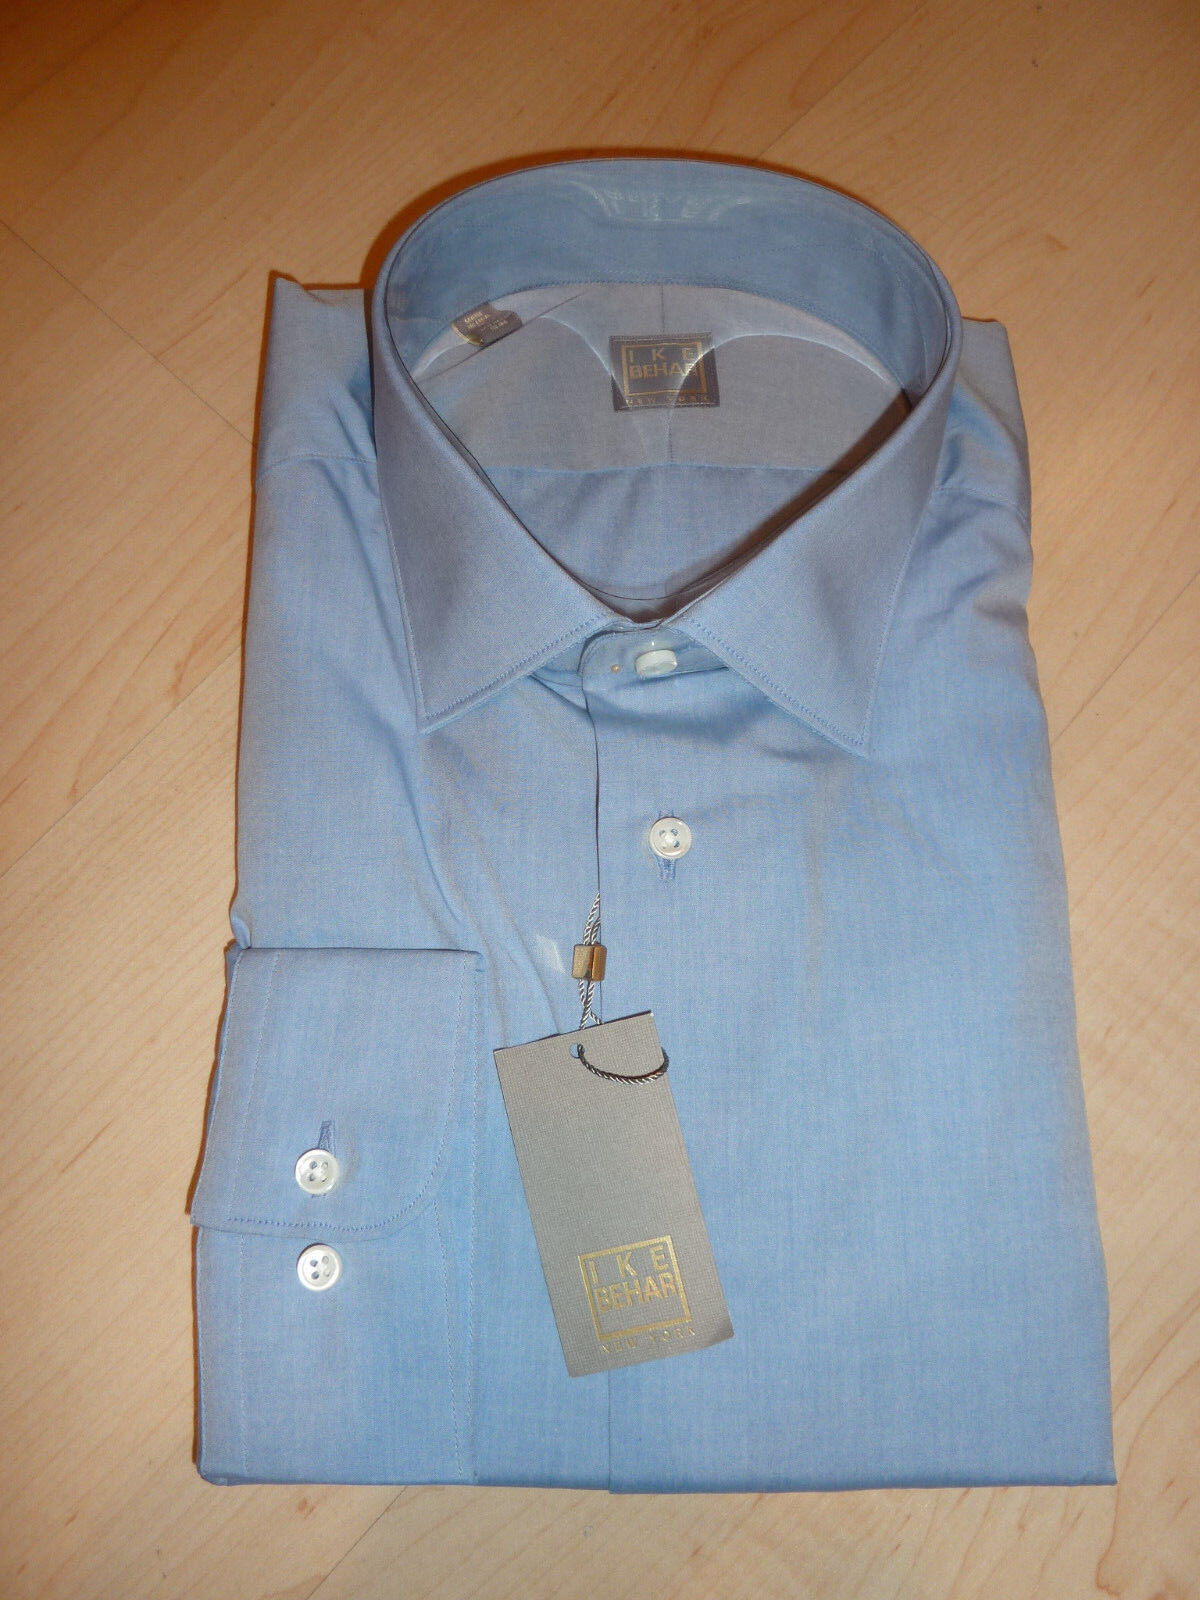 NEW  IKE BEHAR Mens Dress SHIRT 16 34 35 bluee Made in USA SLIM BC gold